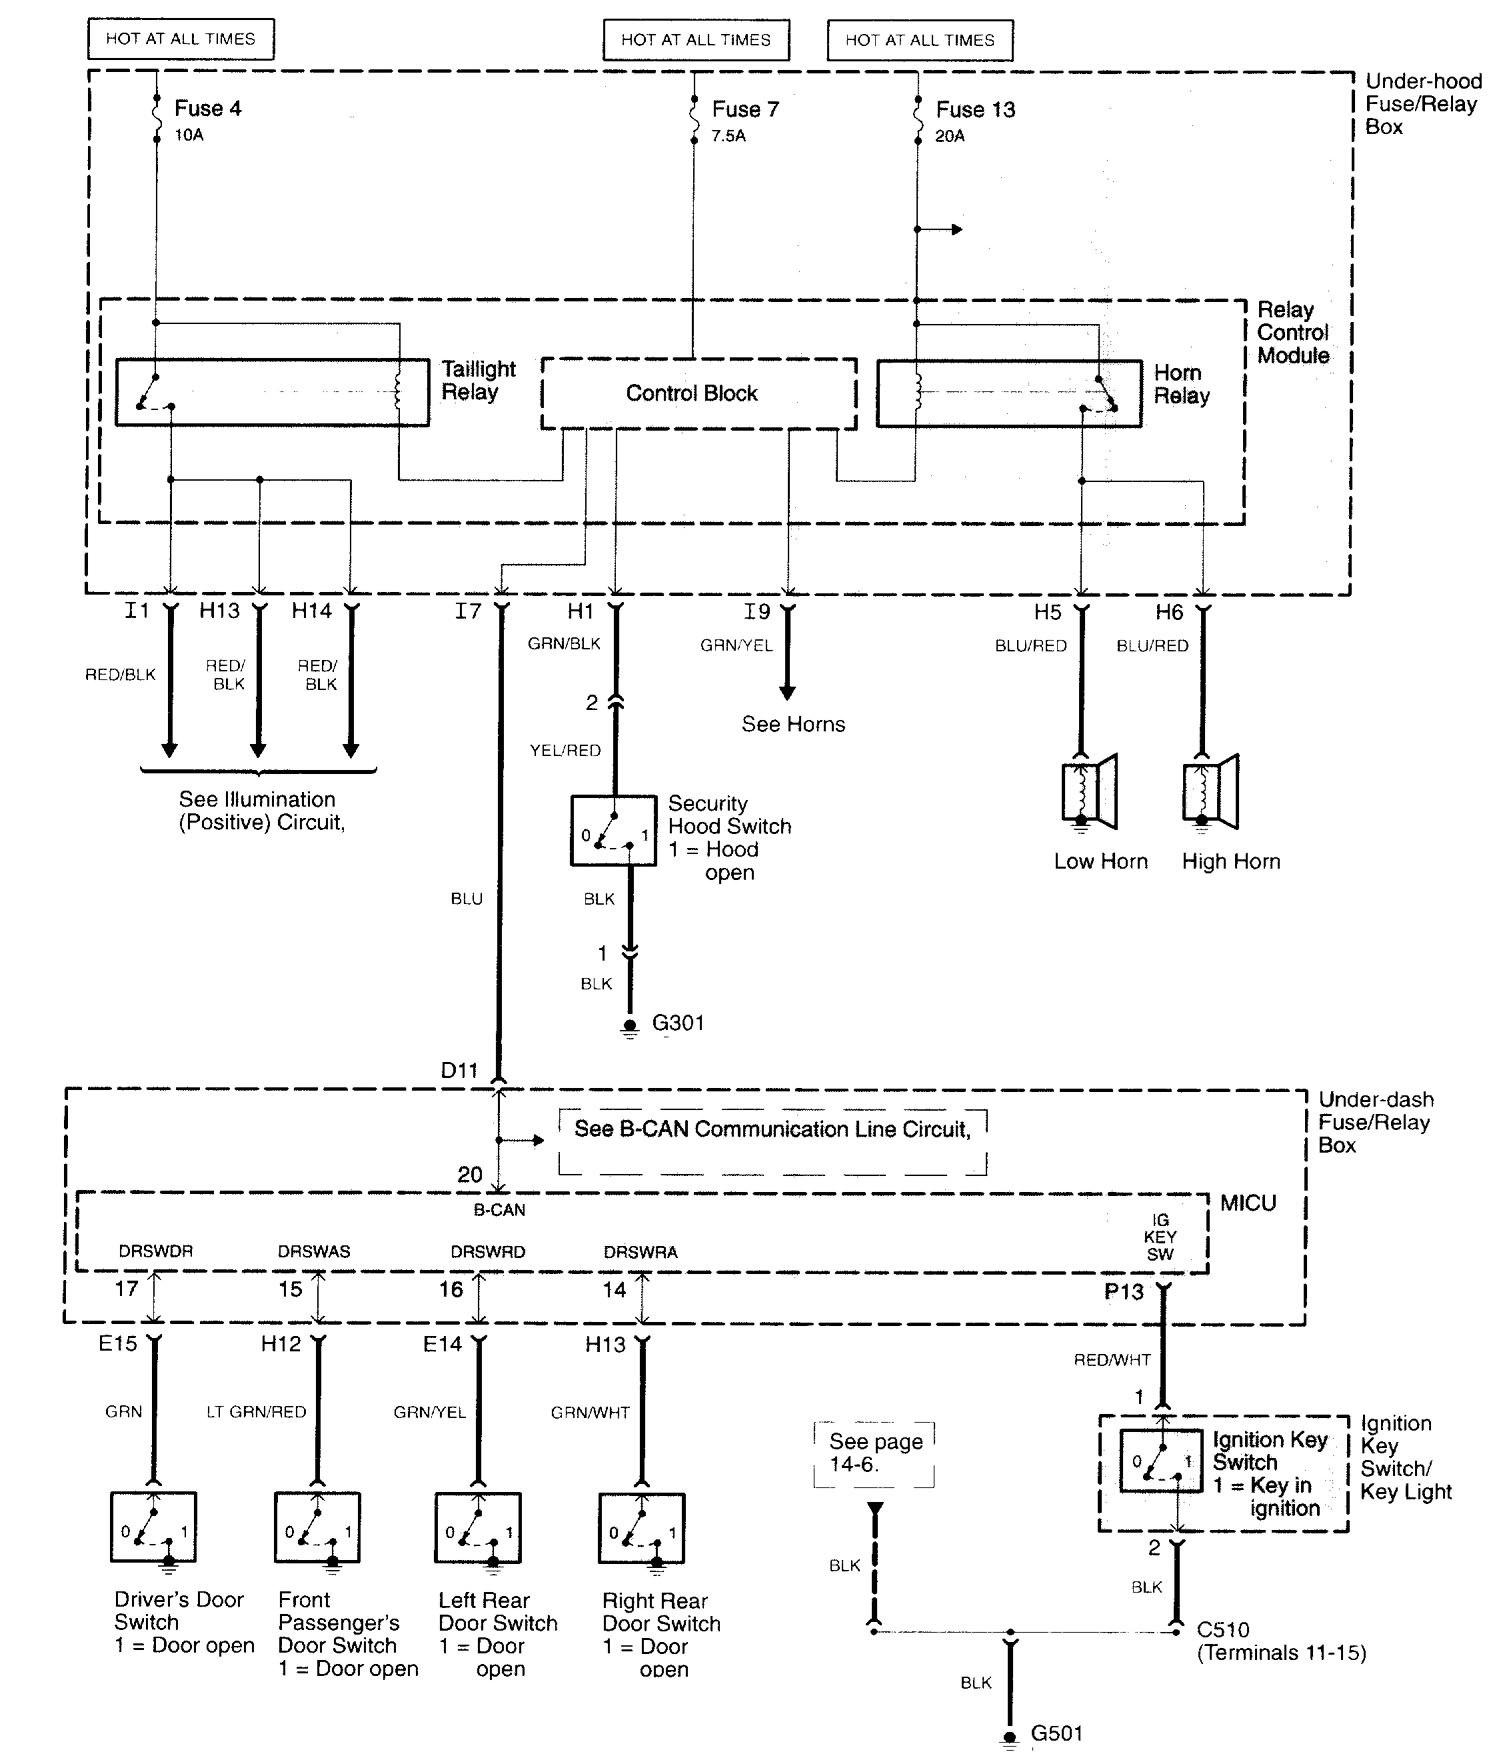 Phenomenal Acura Tl 2003 2005 Wiring Diagrams Keyless Entry Carknowledge Wiring Cloud Icalpermsplehendilmohammedshrineorg